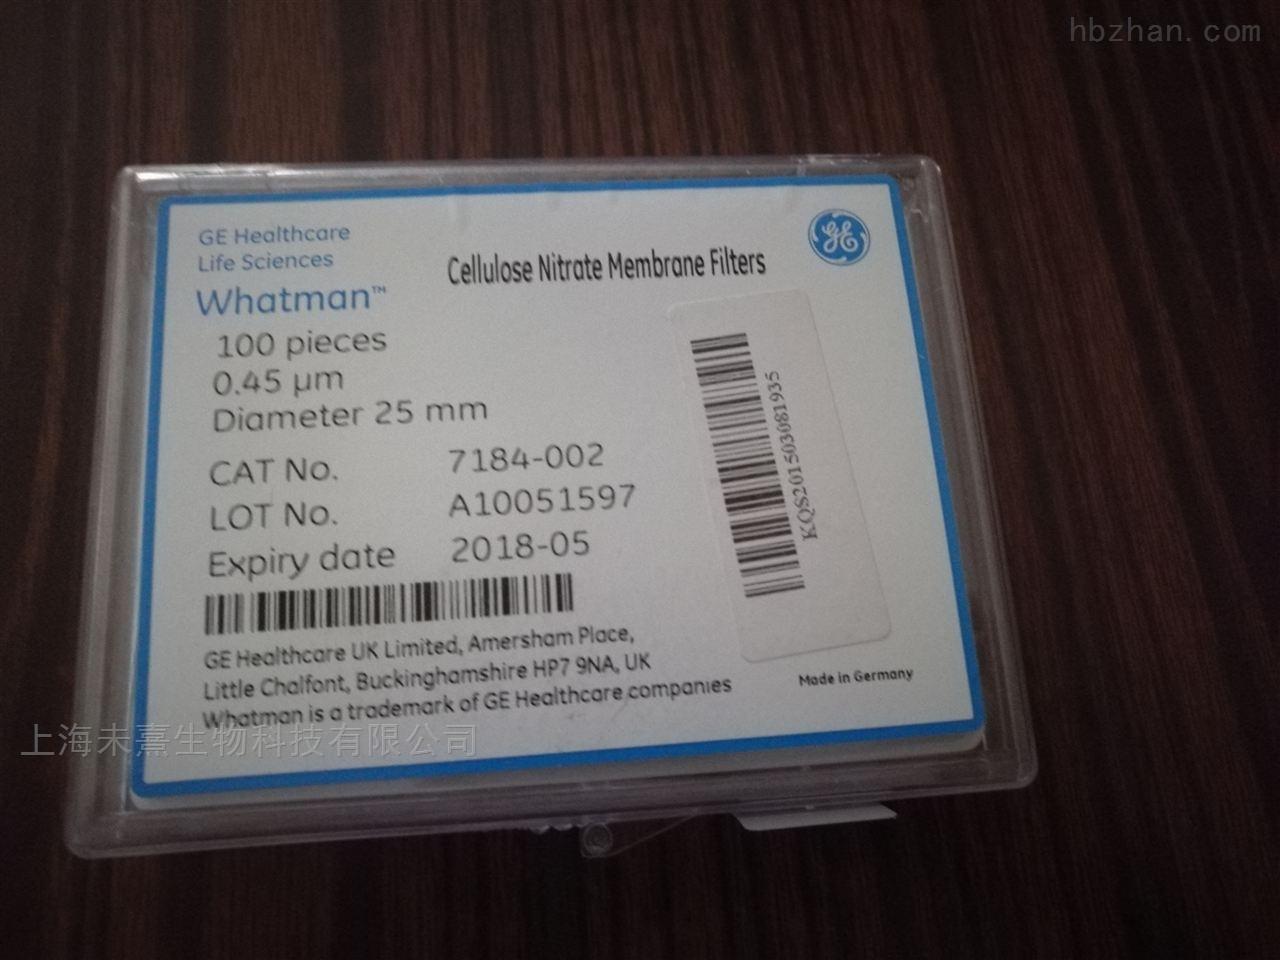 GE沃特曼孔径0.45um硝酸纤维素过滤膜